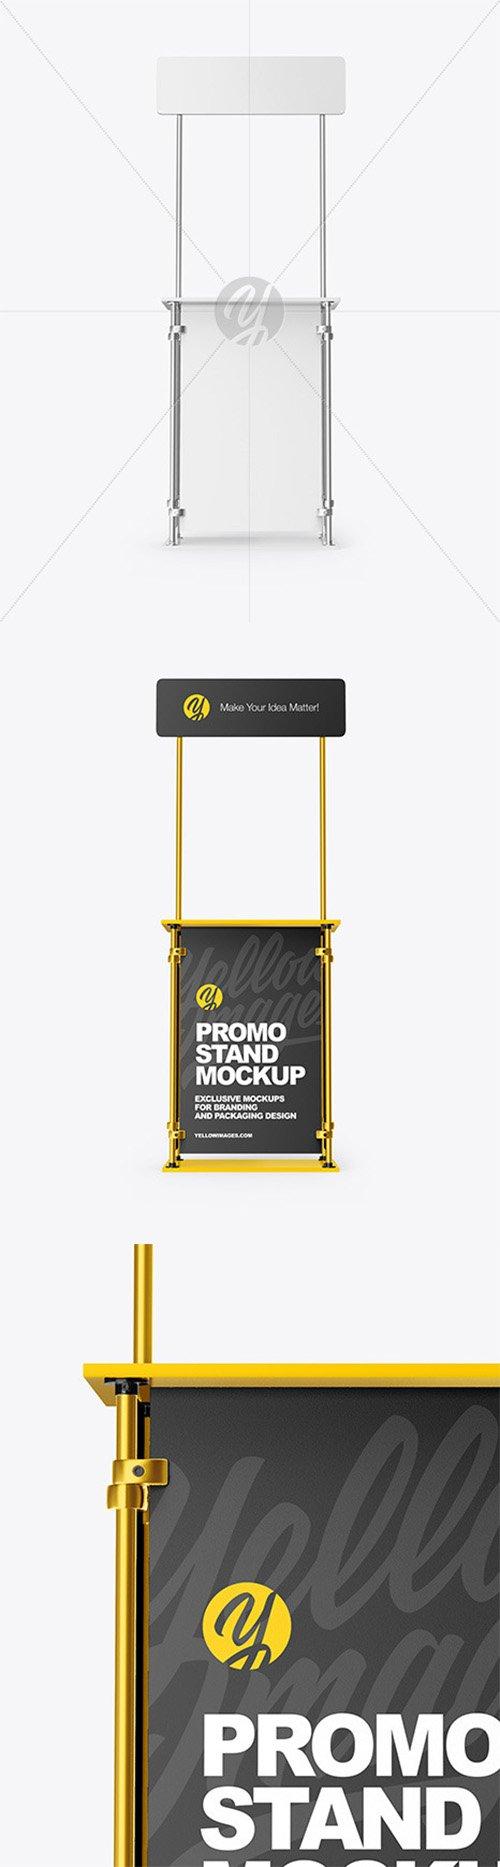 Metallic Promo Stand Mockup 63596 TIF